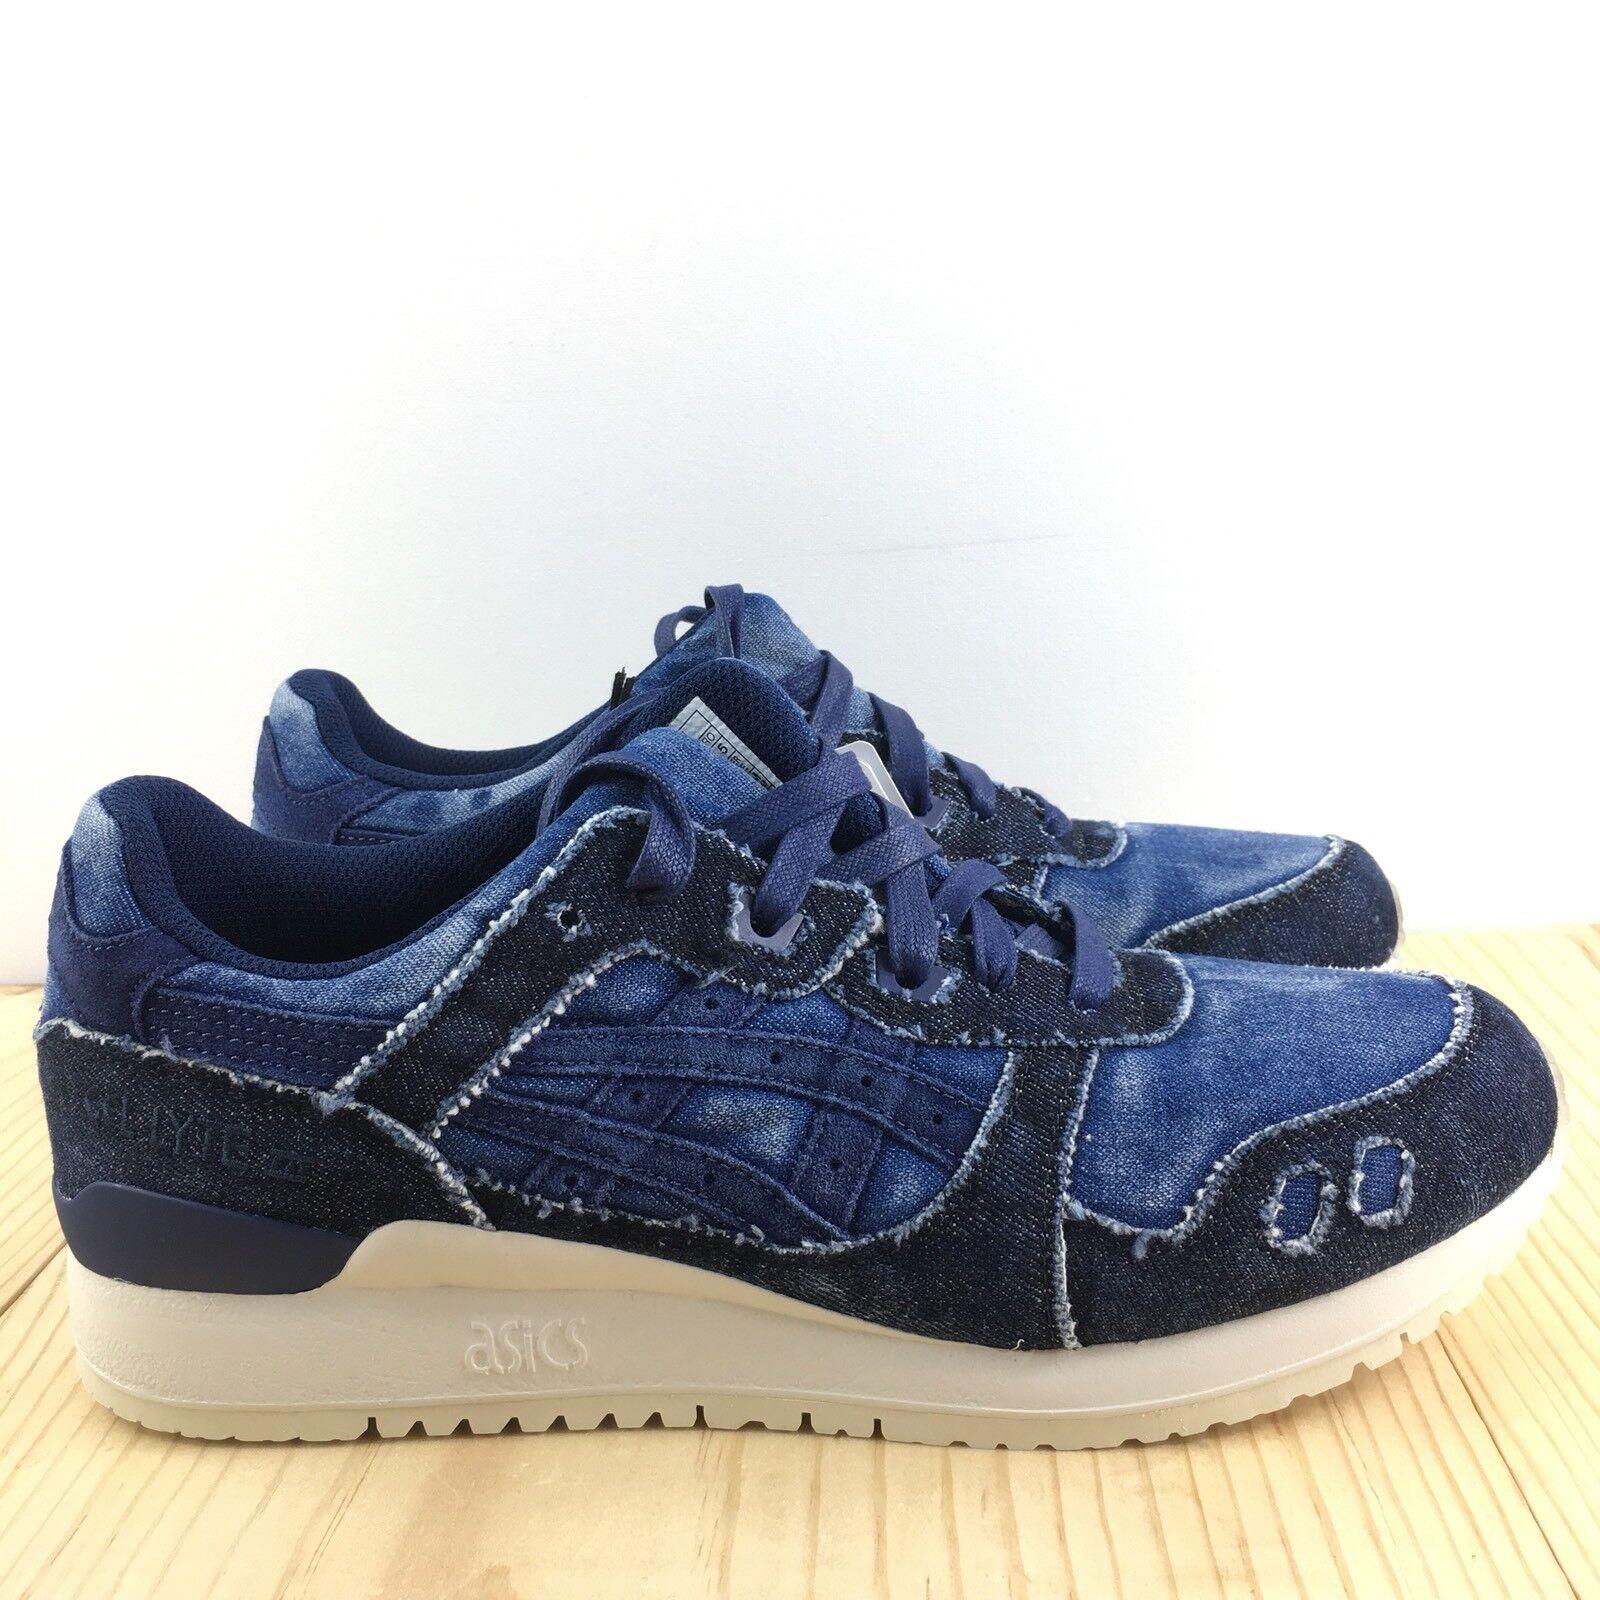 Asics Gel Lyte III Size 9 Japanese Denim Indigo Blue Mens Shoes H7D3N